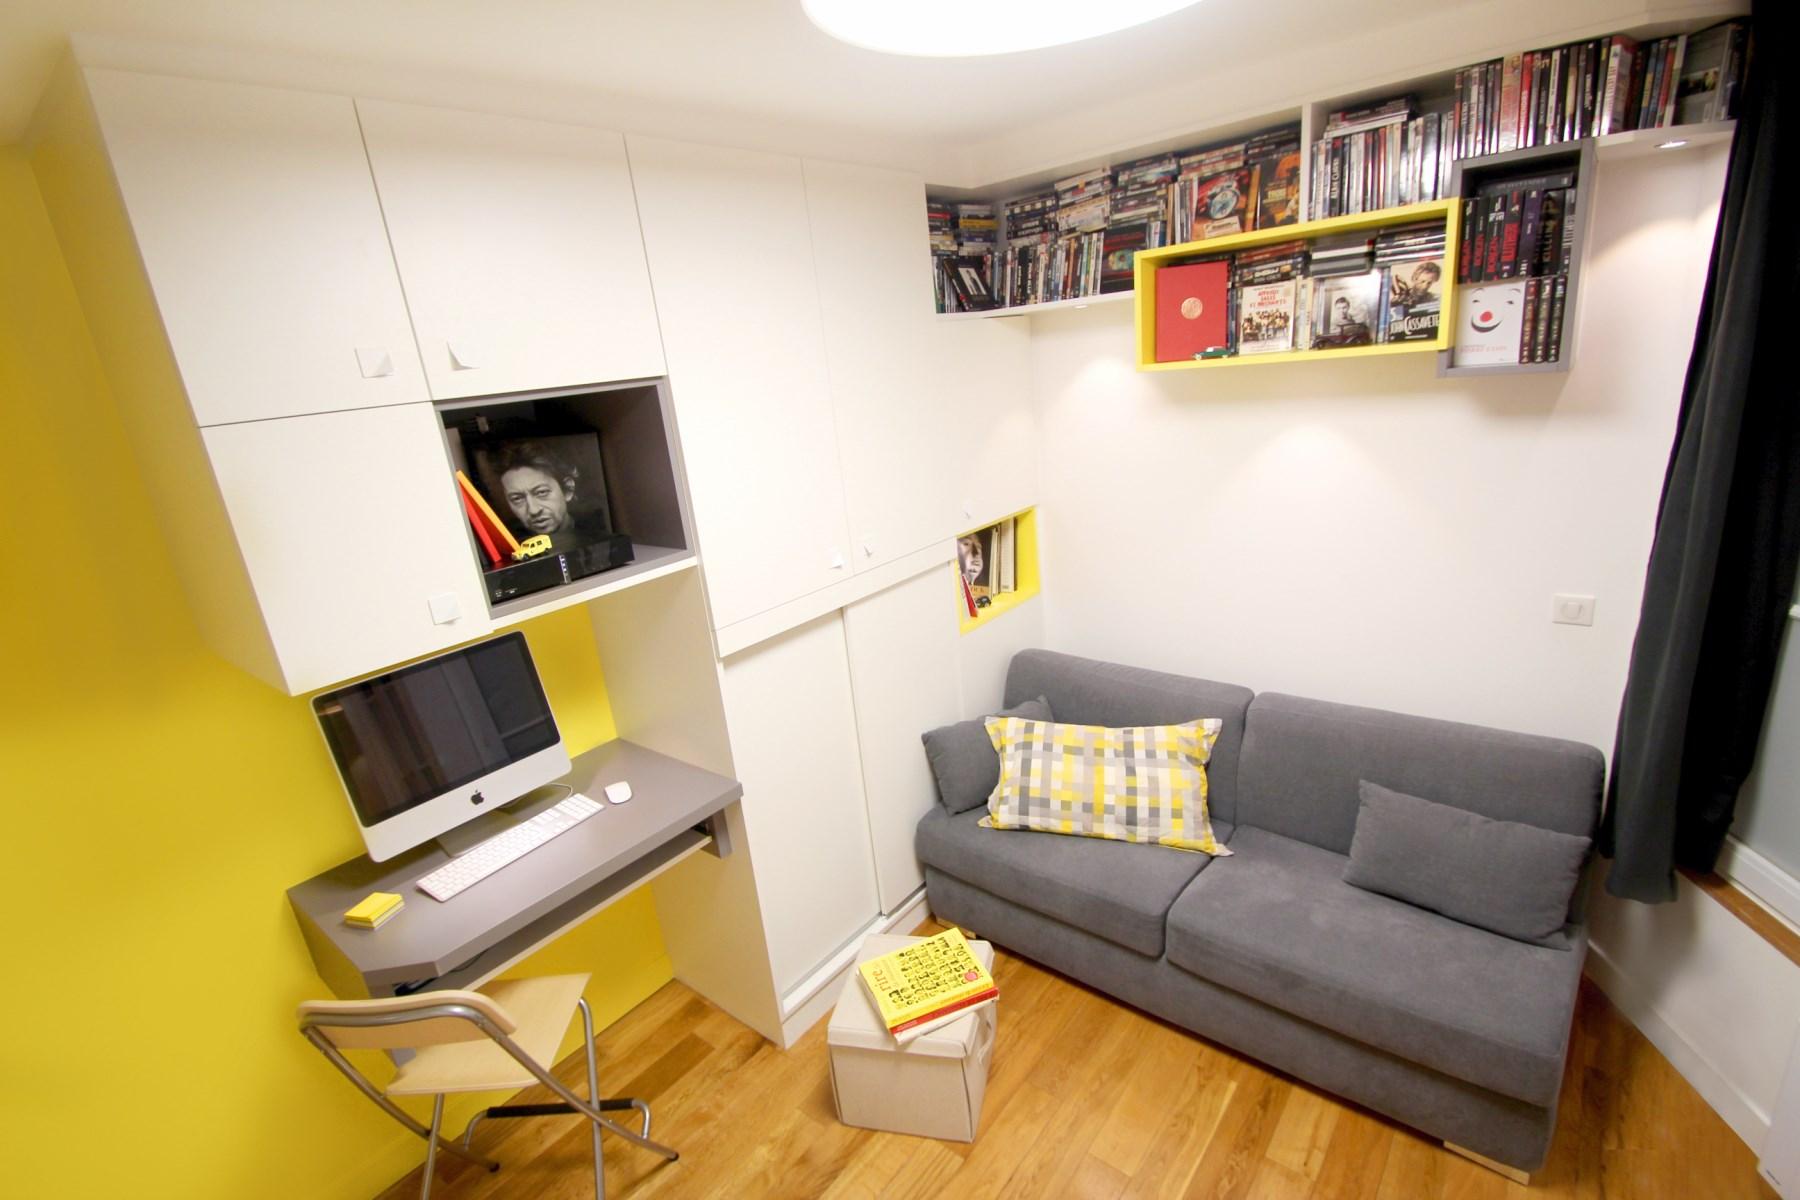 Appartement Passage Du Grand Cerf Paris Studio Transform 233